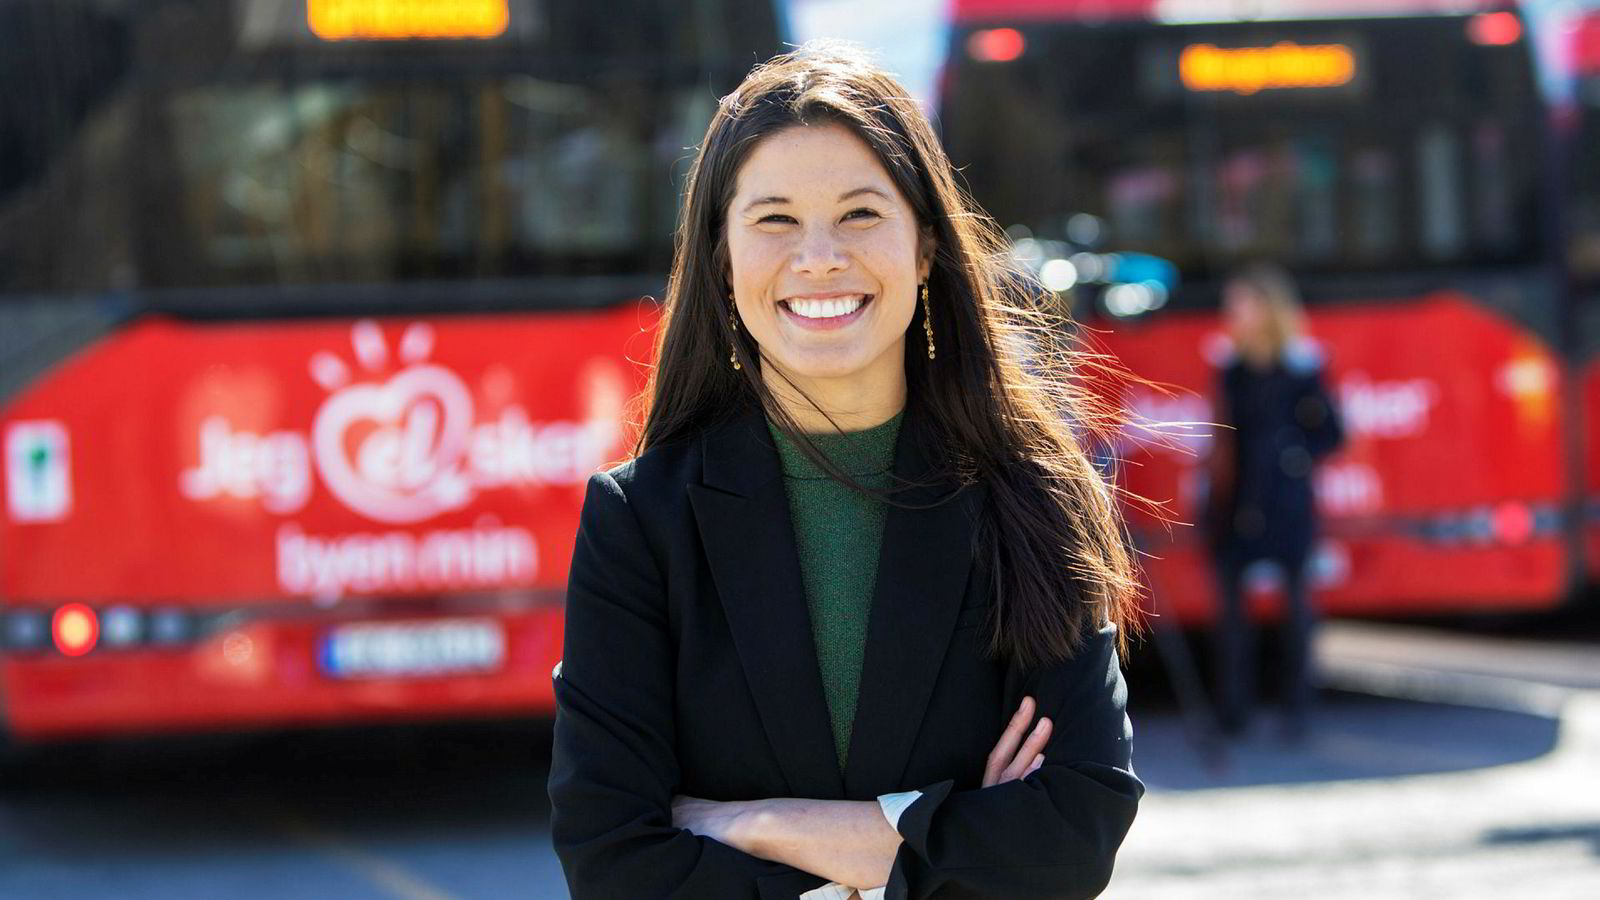 Miljøbyråd Lan Marie Nguyen Berg (MDG) er fornøyd med at MDG går fram på meningsmålingene.